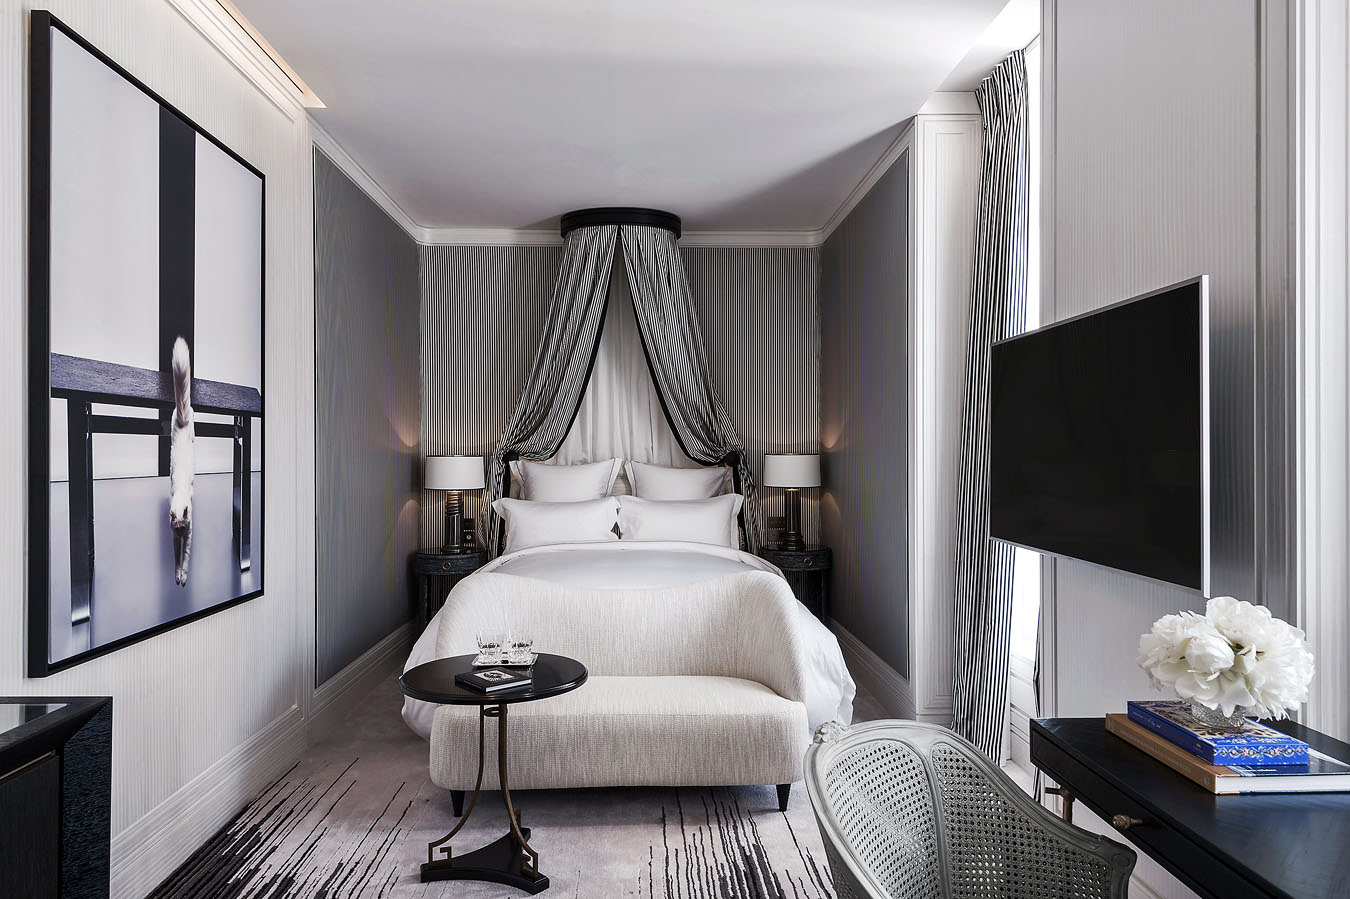 hotel de cillon paris